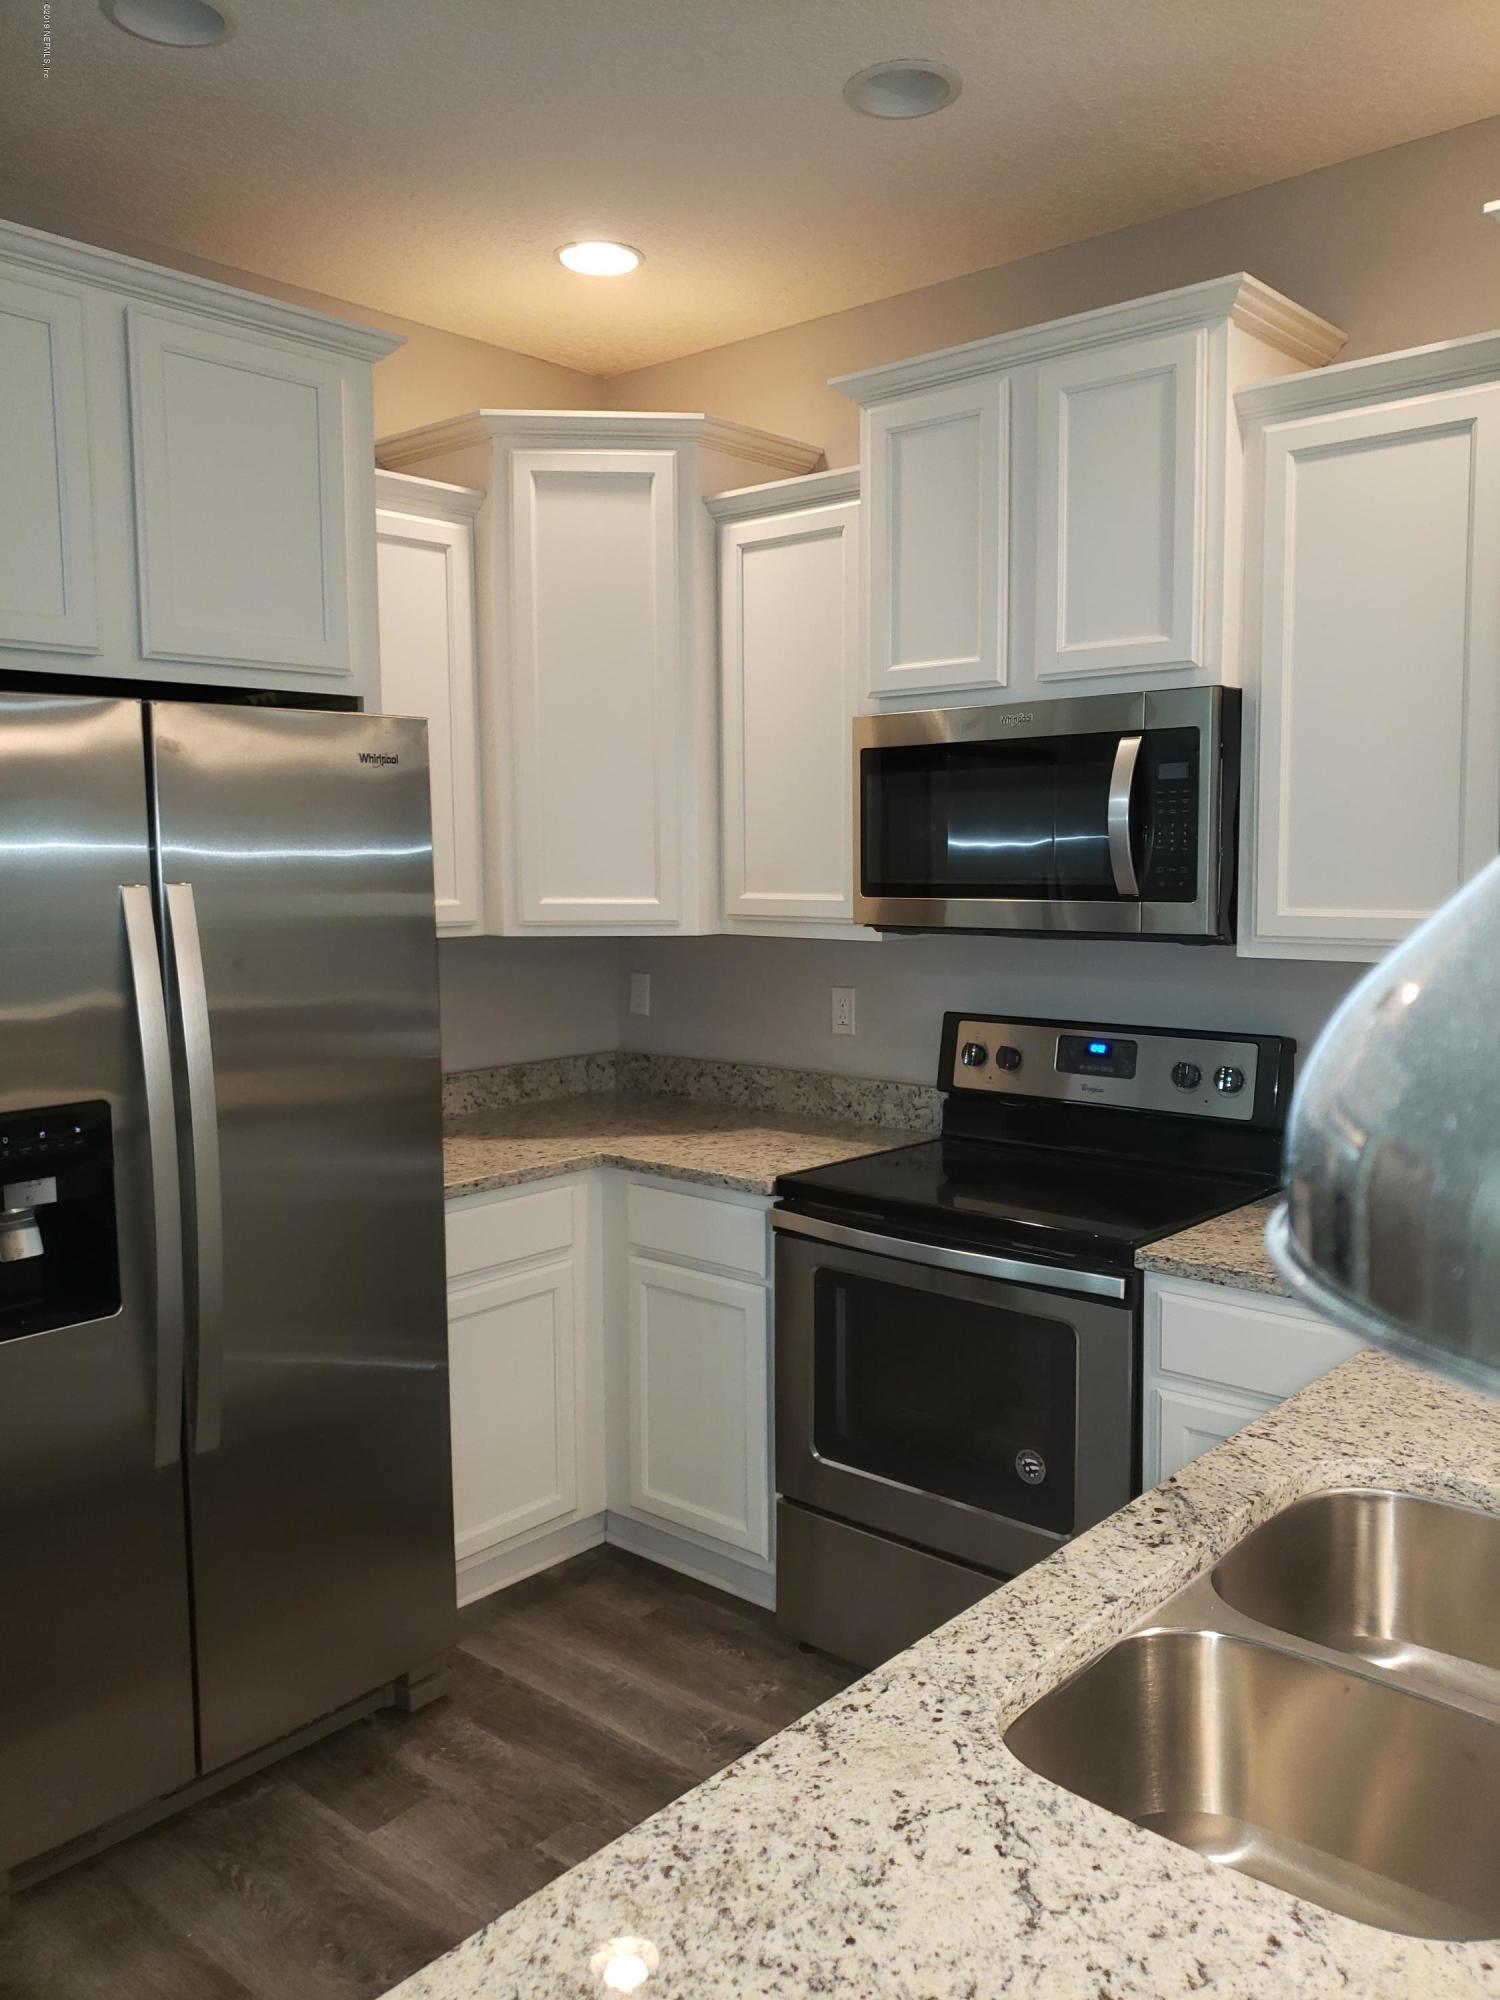 4184 QUIET CREEK- MIDDLEBURG- FLORIDA 32068, 3 Bedrooms Bedrooms, ,2 BathroomsBathrooms,Condo,For sale,QUIET CREEK,1021290